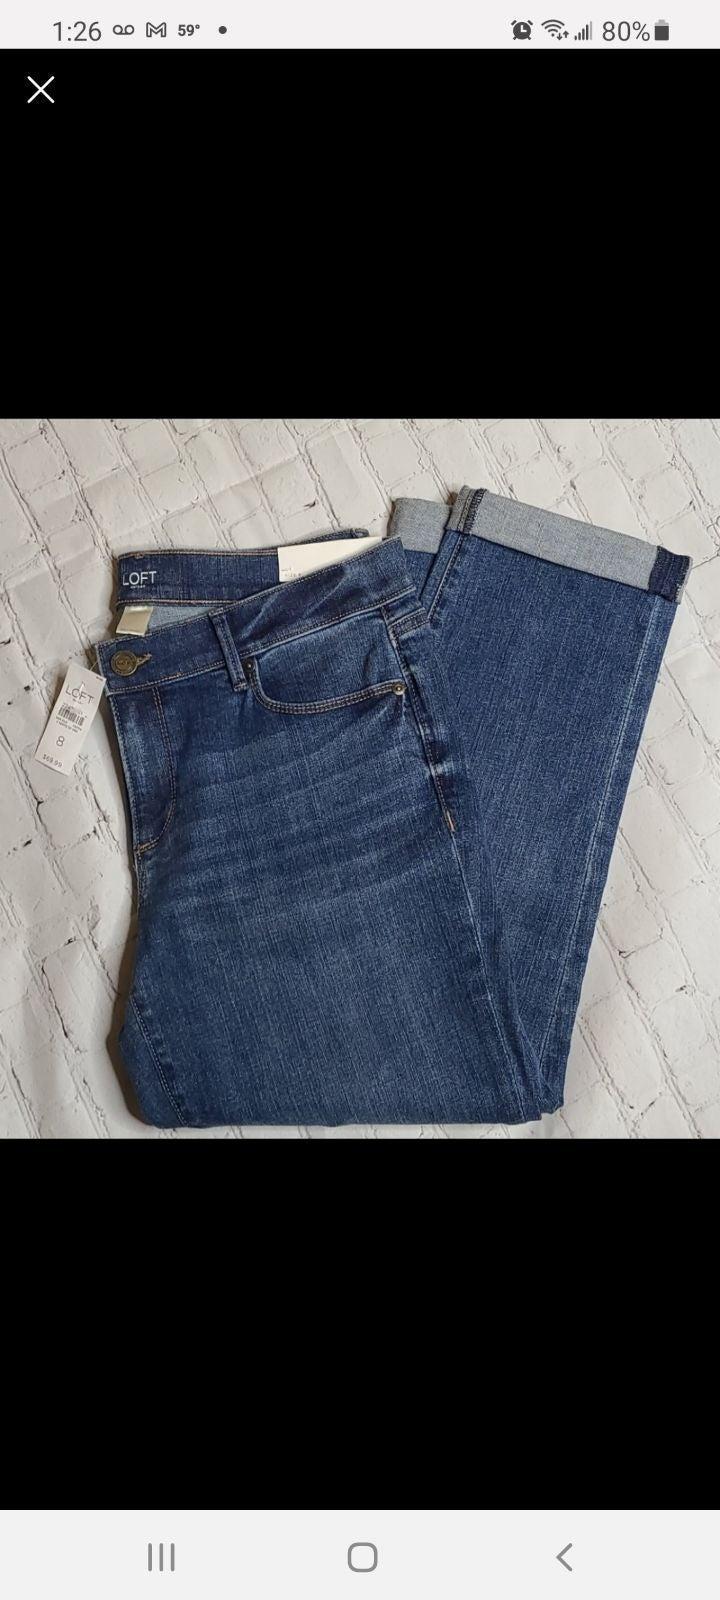 LOFT Cuffed Crop Jeans